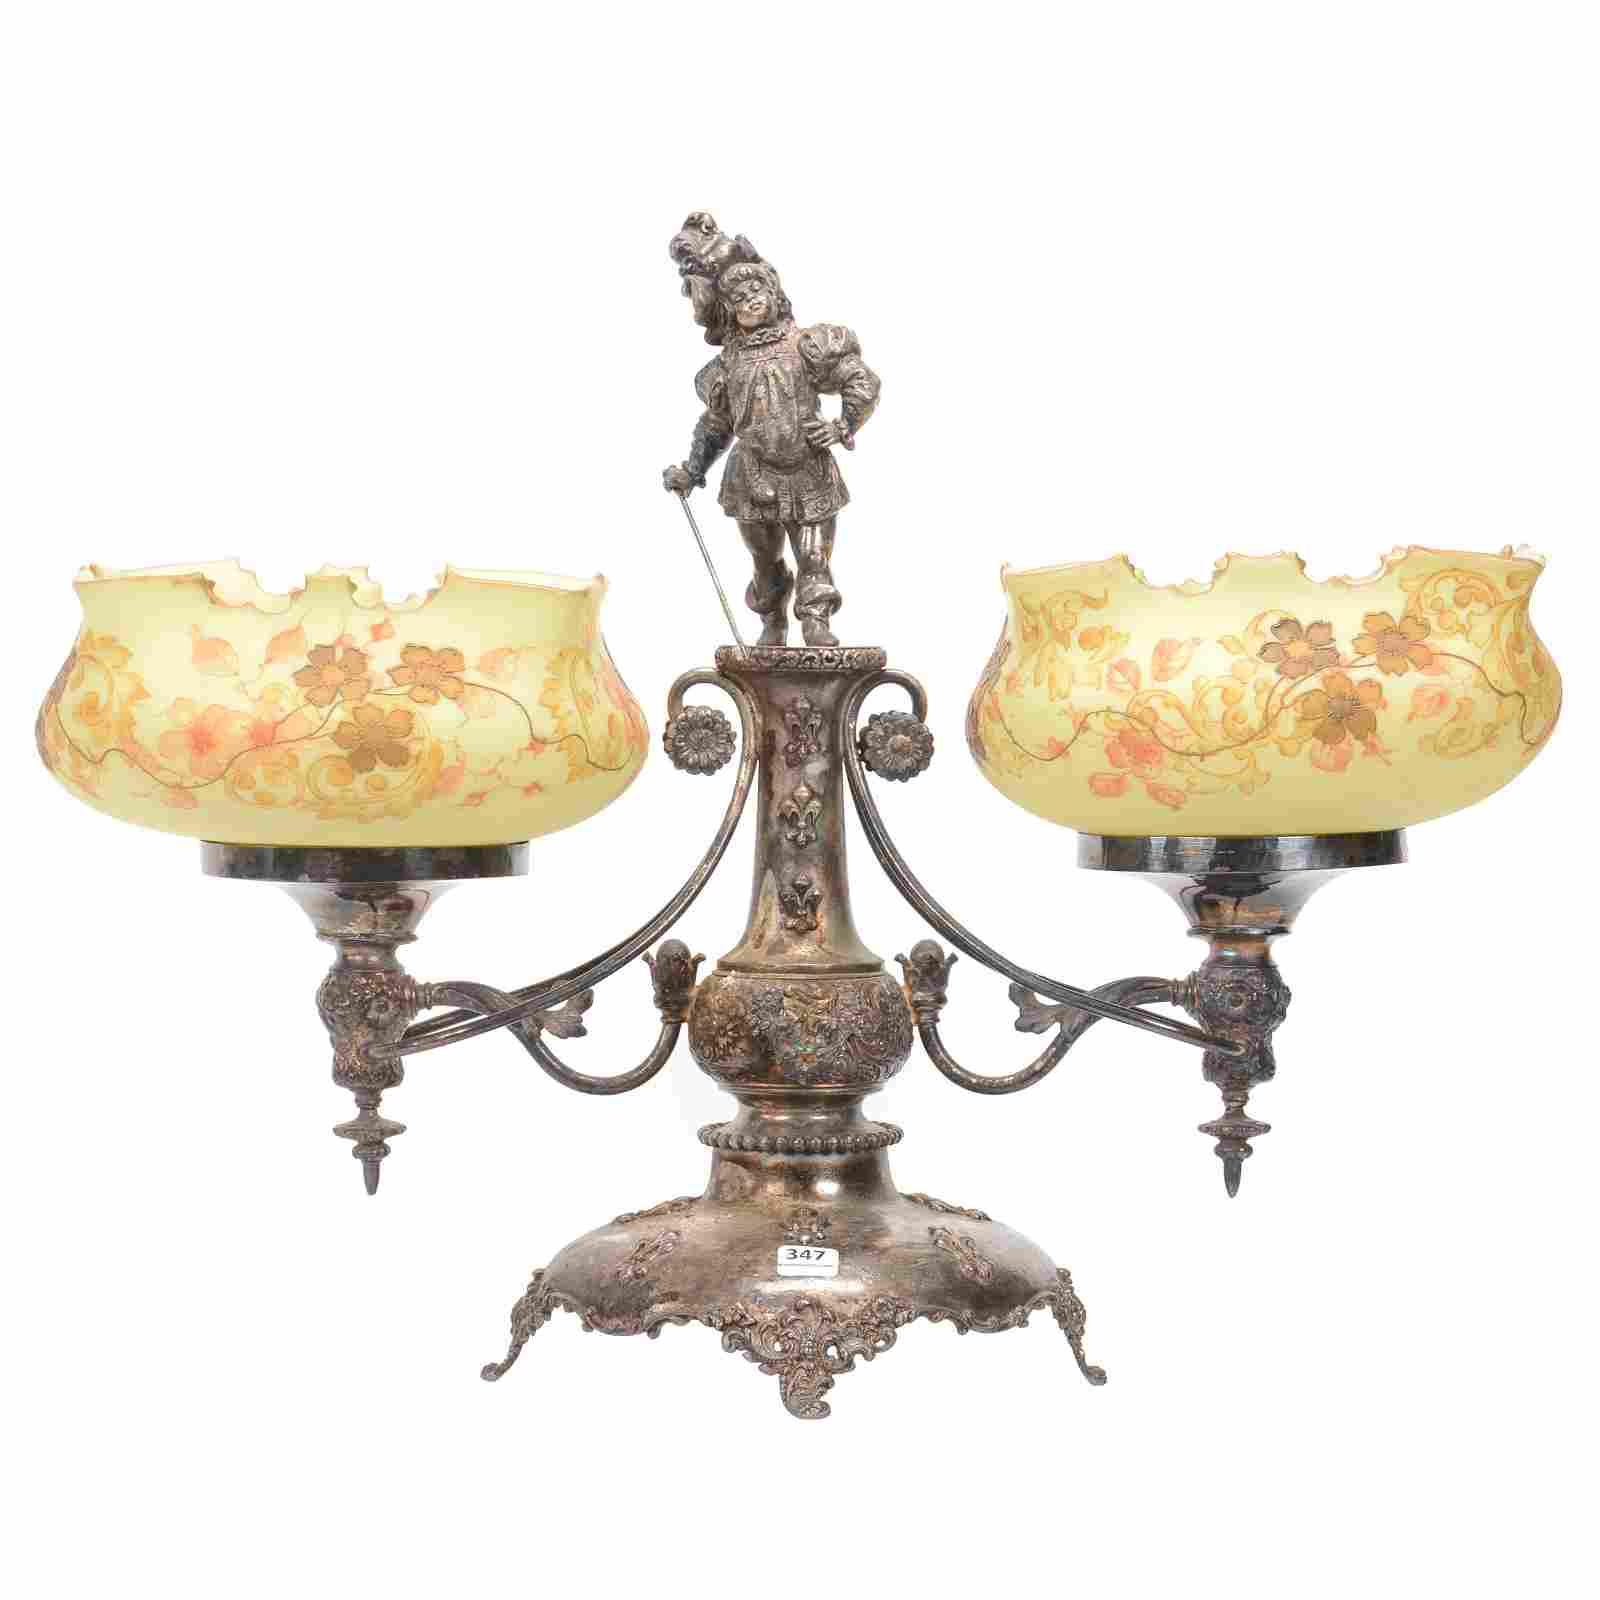 Double Brides Basket, Crown Milano Style Art Glass